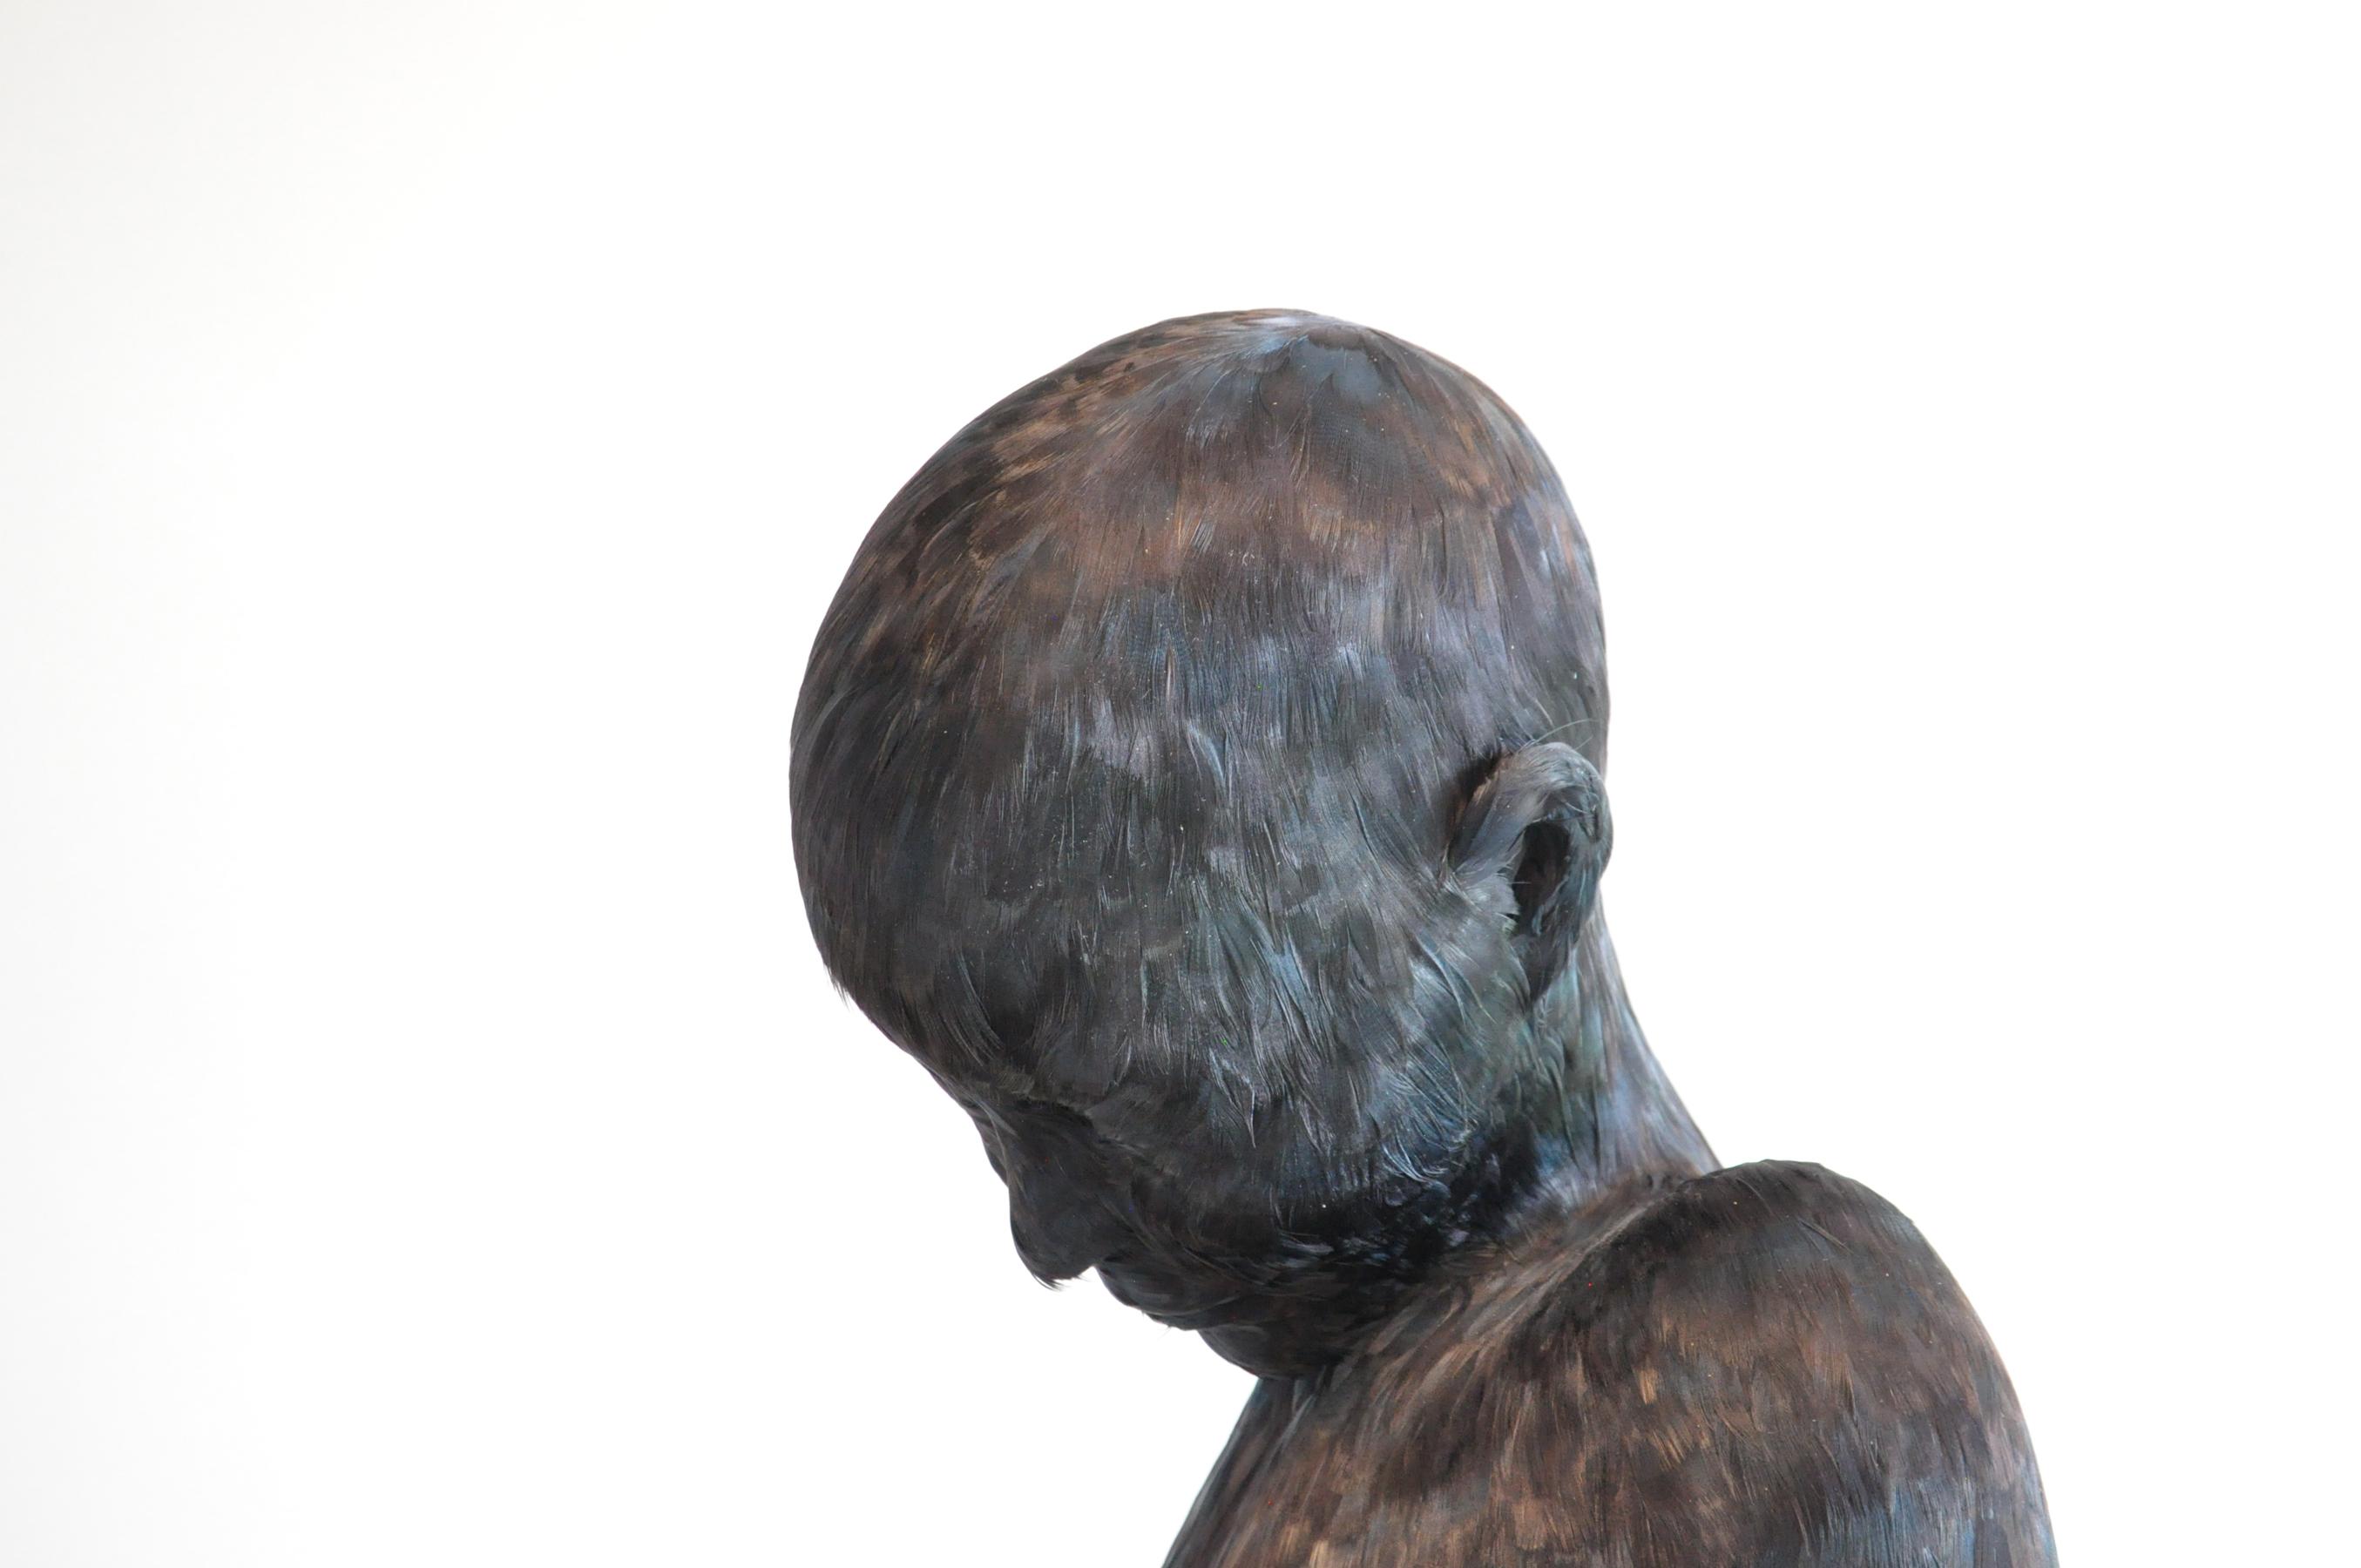 Child Head 3